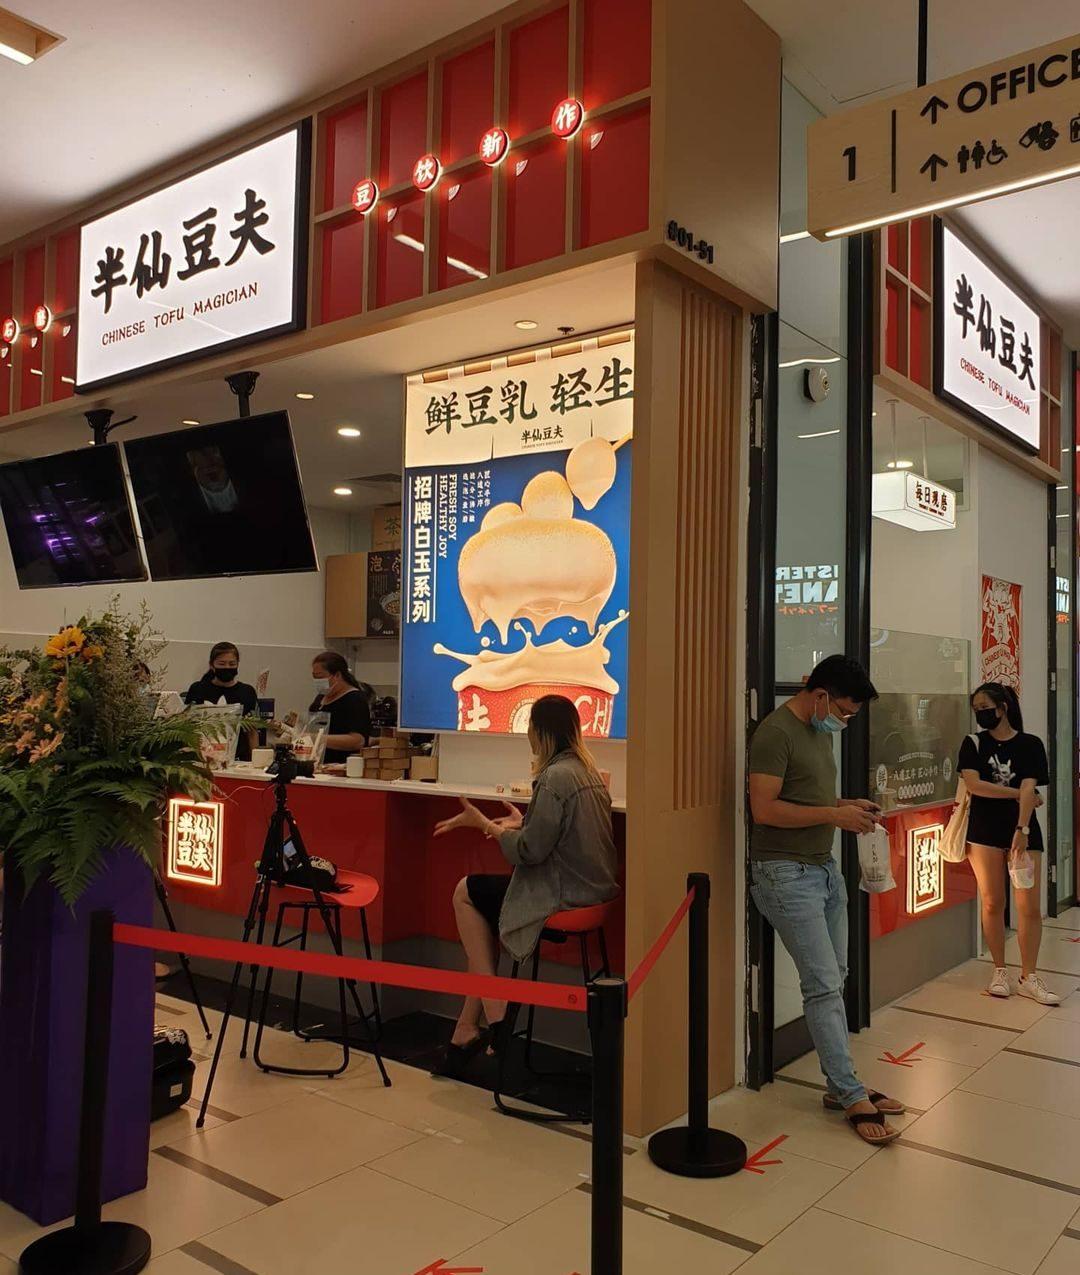 chinese tofu magician - storefront